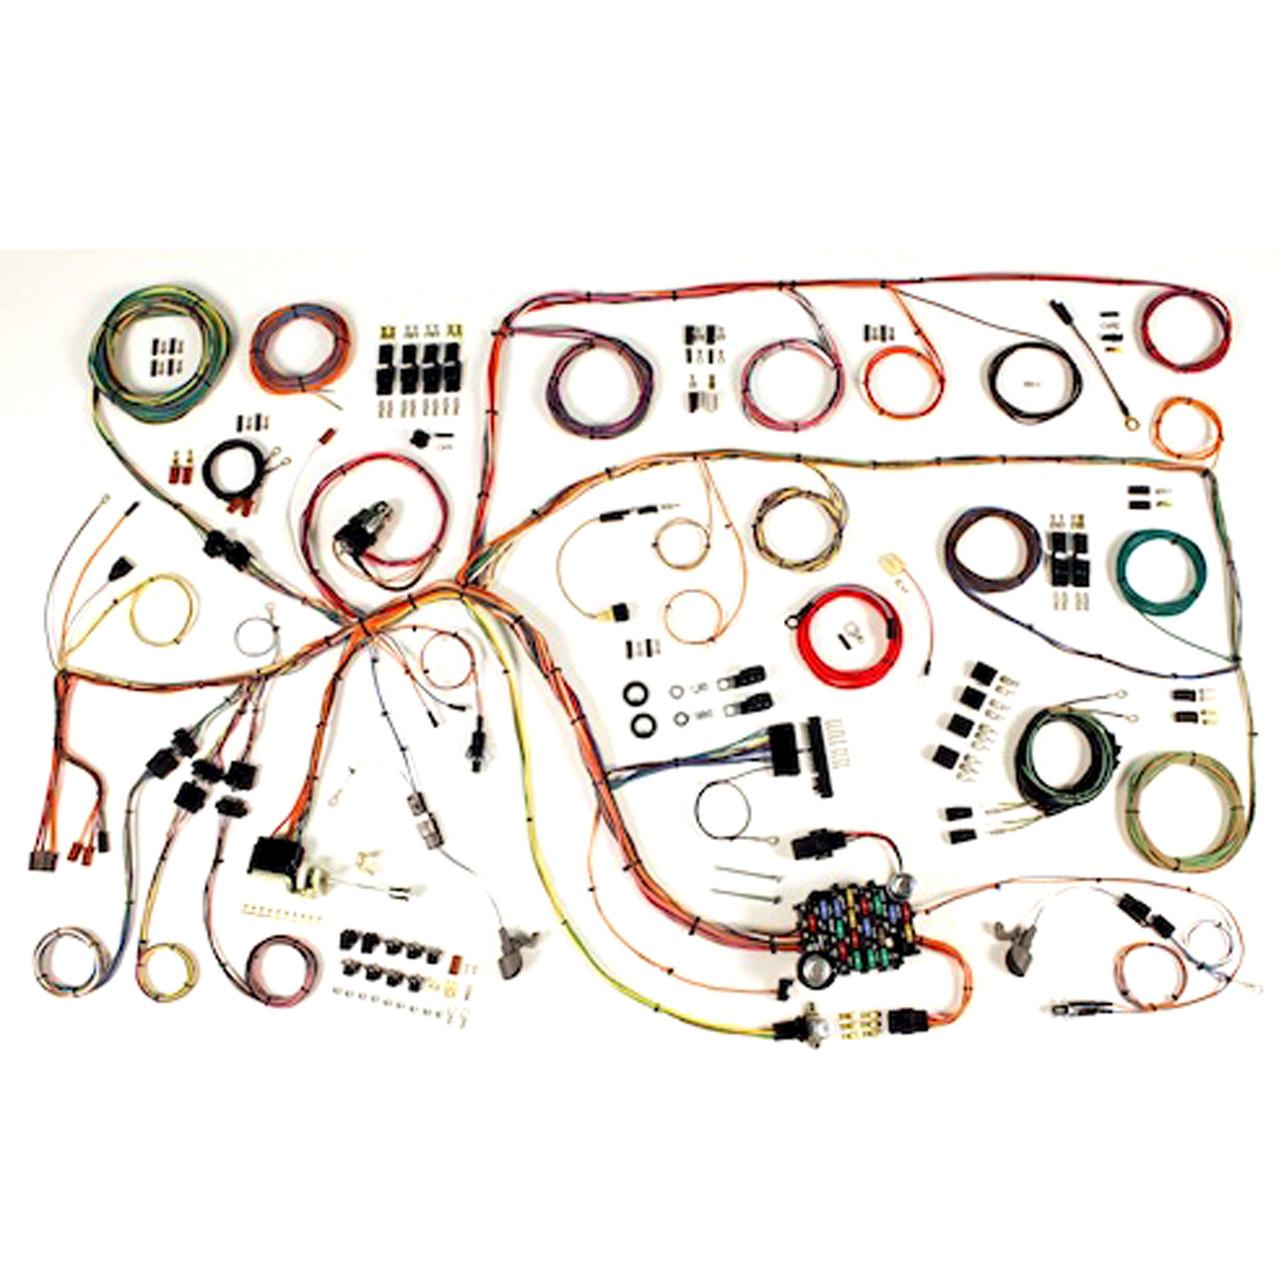 hight resolution of 1964 mercury comet wiring online wiring diagram 1966 mercury monterey 1966 mercury cyclone wiring diagrams